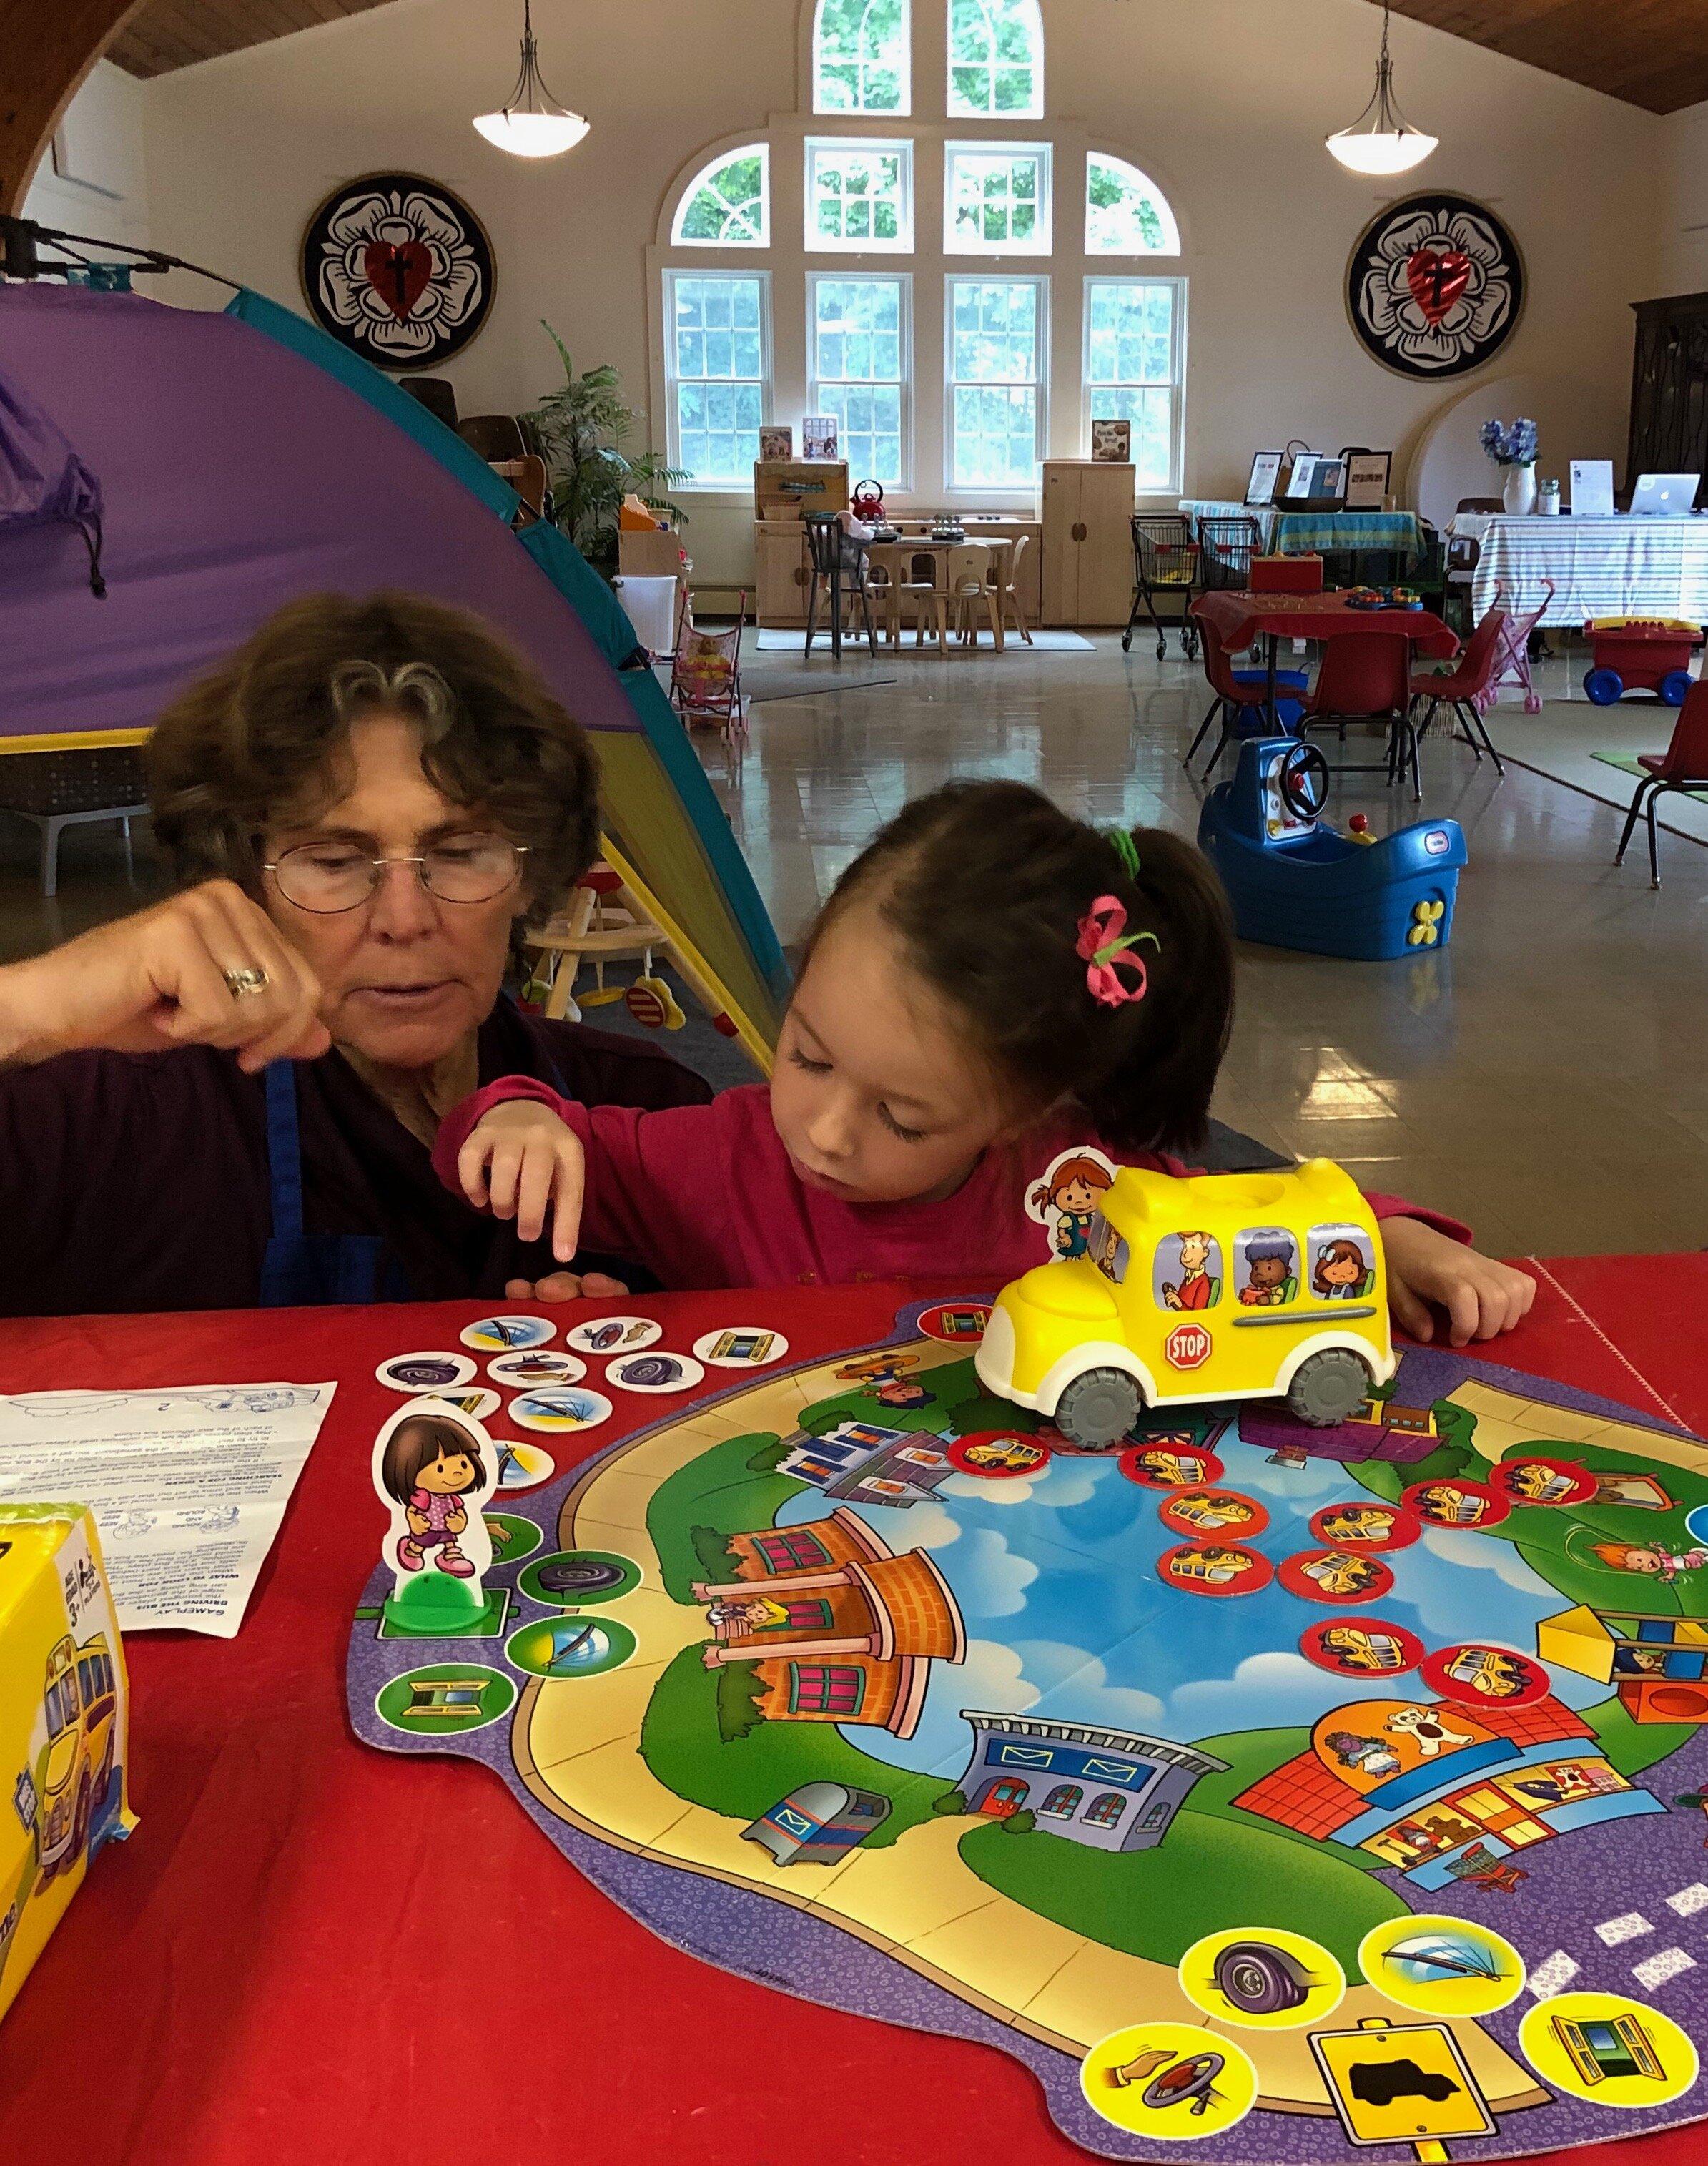 photo Bonny & child with School bus game.jpg